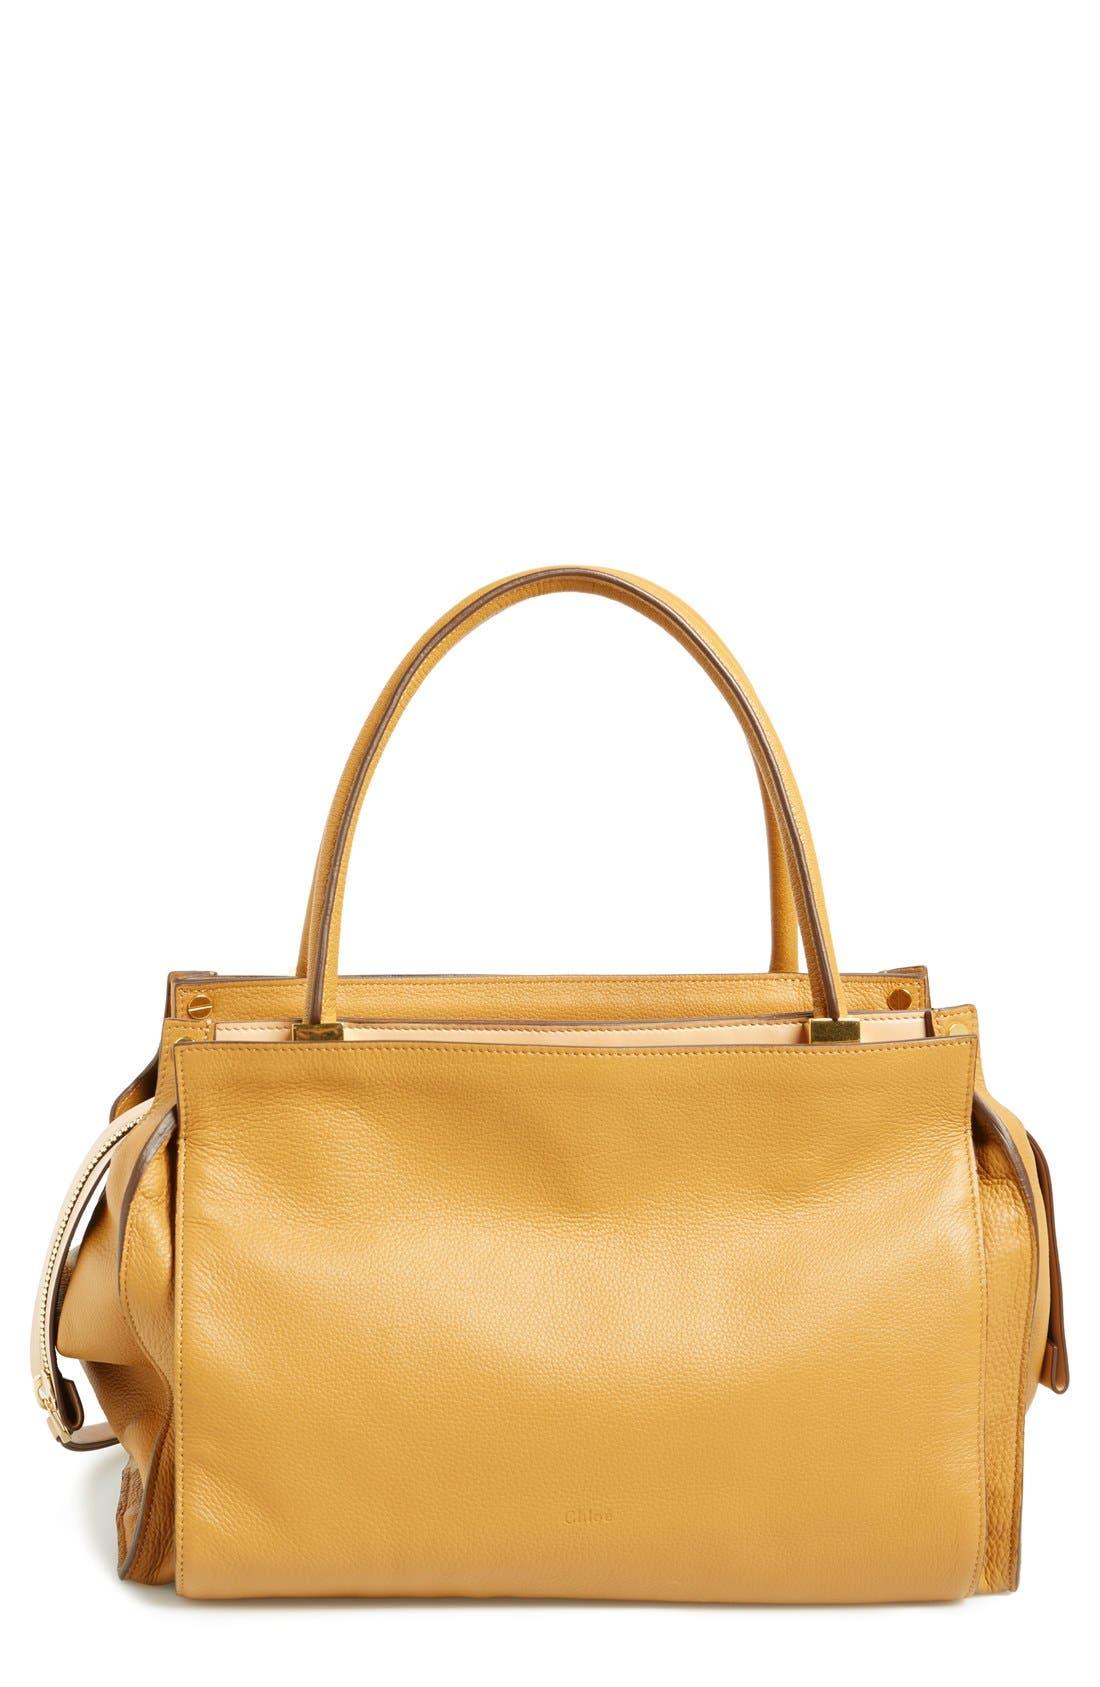 Main Image - Chloé 'Dree - Medium' Leather Satchel